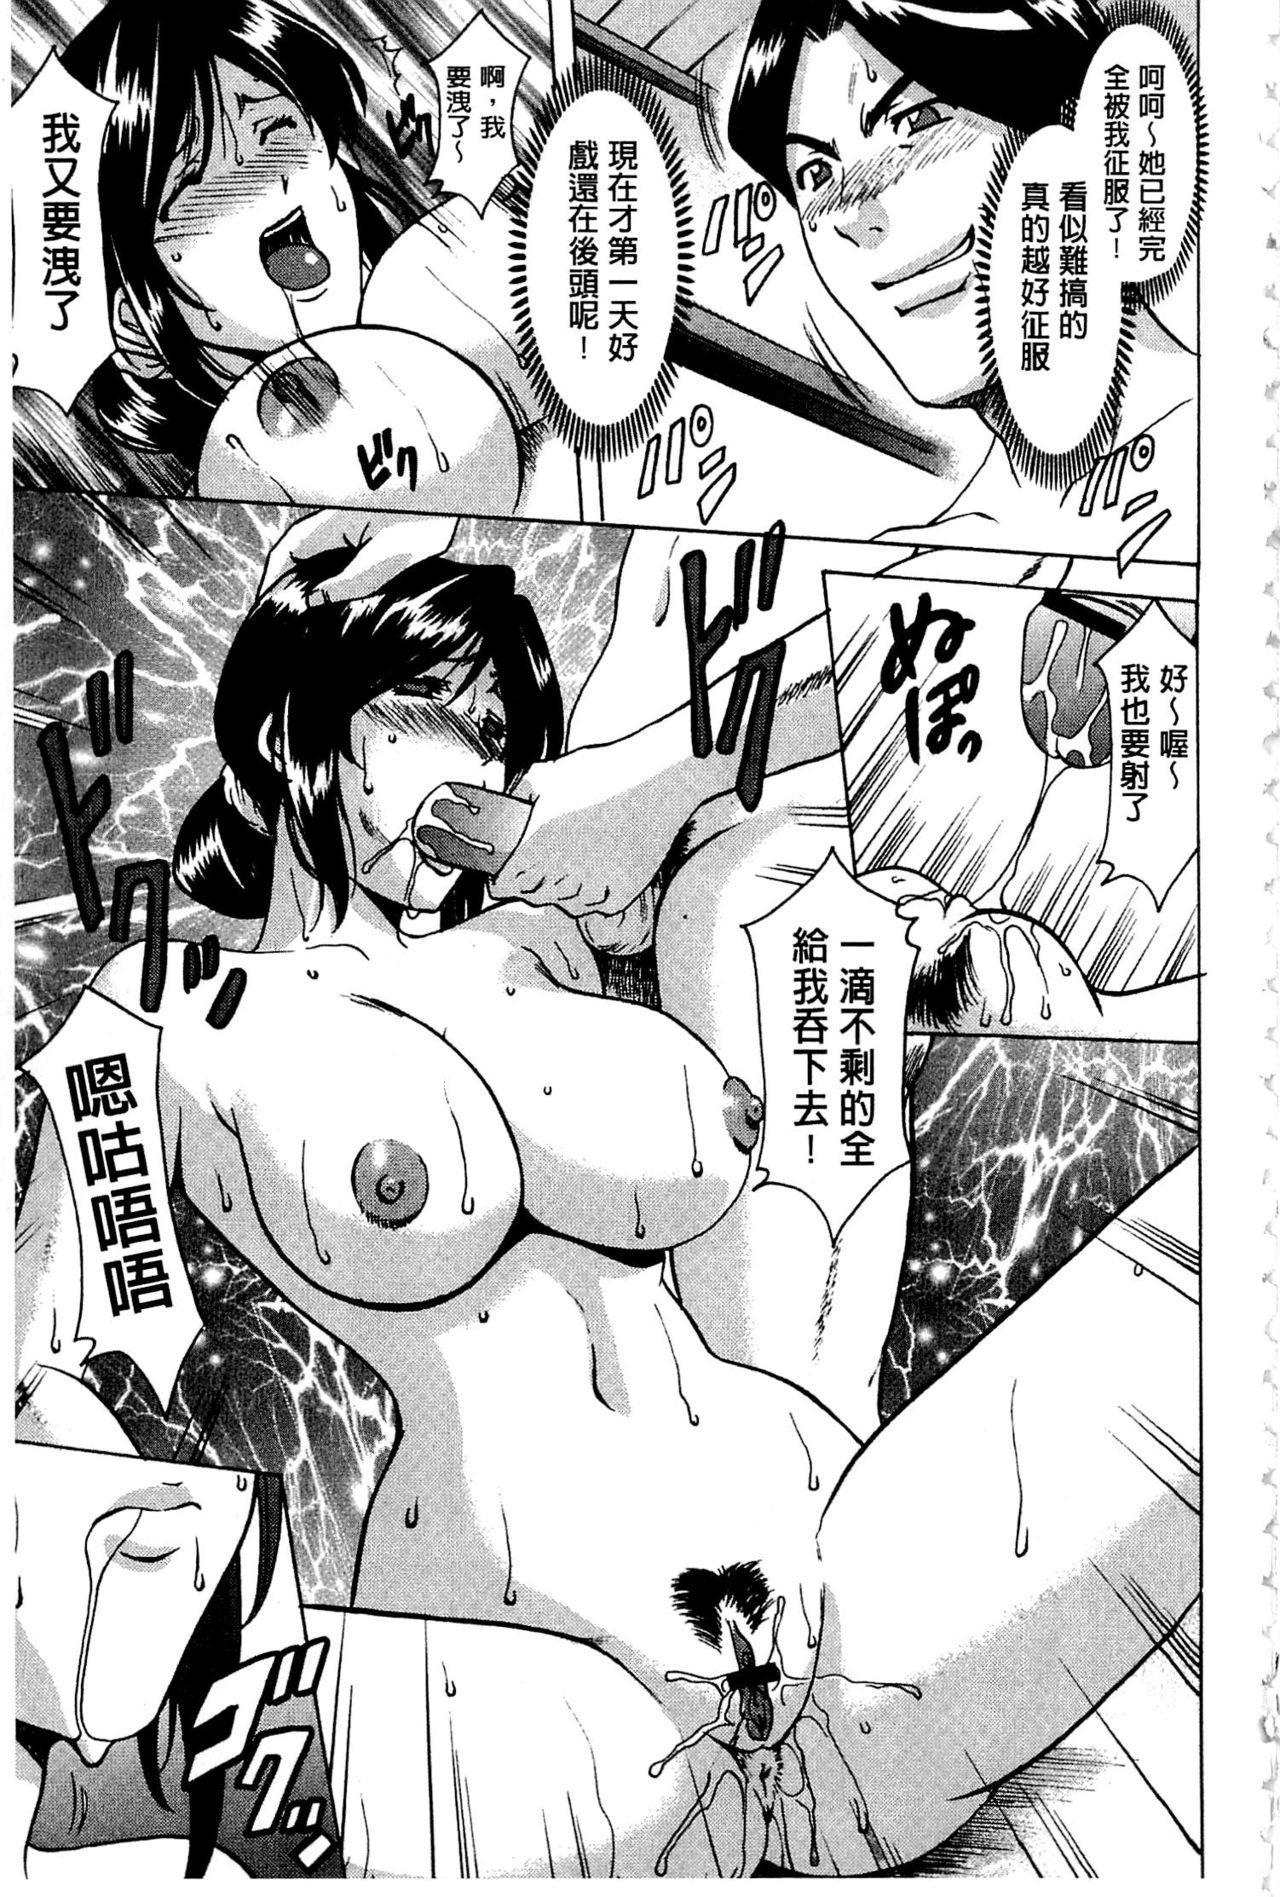 Sennyu Tsuma Satomi Kiroku | 臥底人妻里美 洗腦凌辱的記錄 上集 136